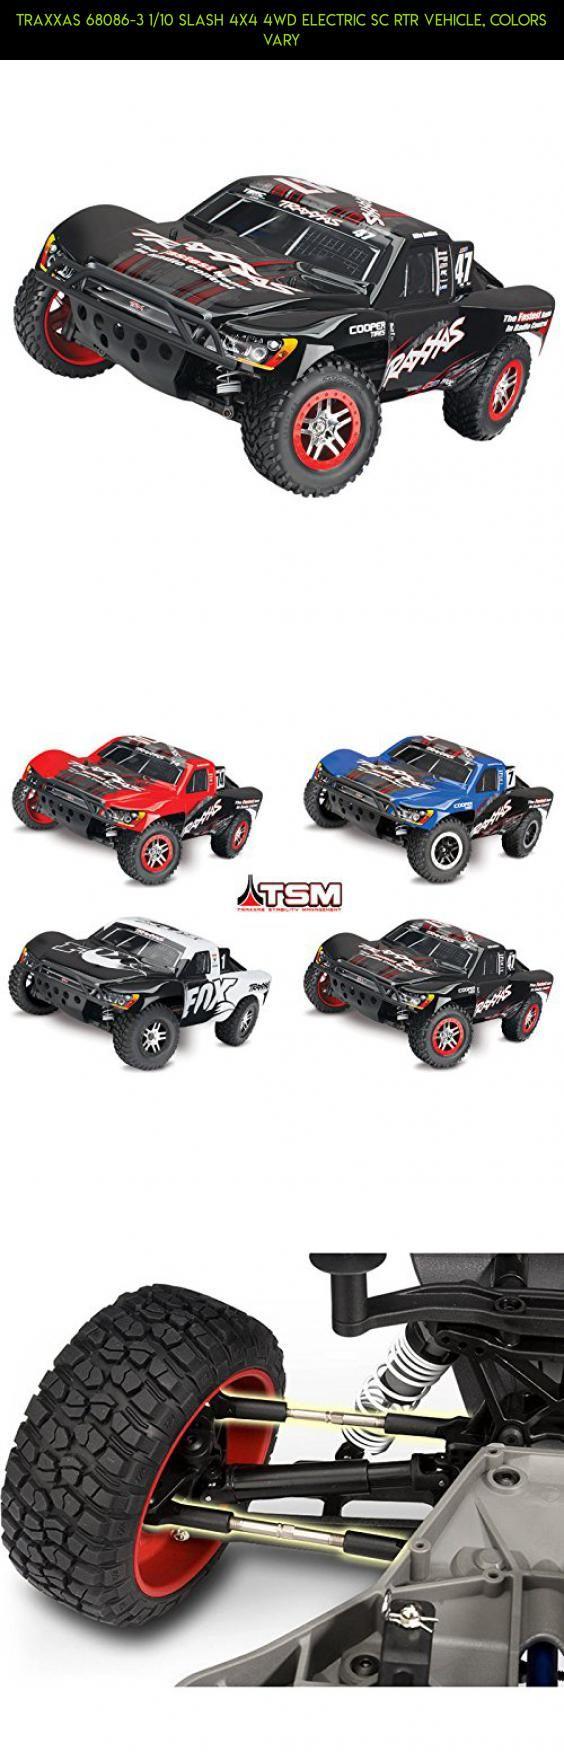 Traxxas 68086-3 1/10 Slash 4X4 4WD Electric SC RTR Vehicle, Colors Vary #shopping #racing #parts #fpv #slash #plans #camera #kit #gadgets #traxxas #4x4 #technology #drone #tech #products